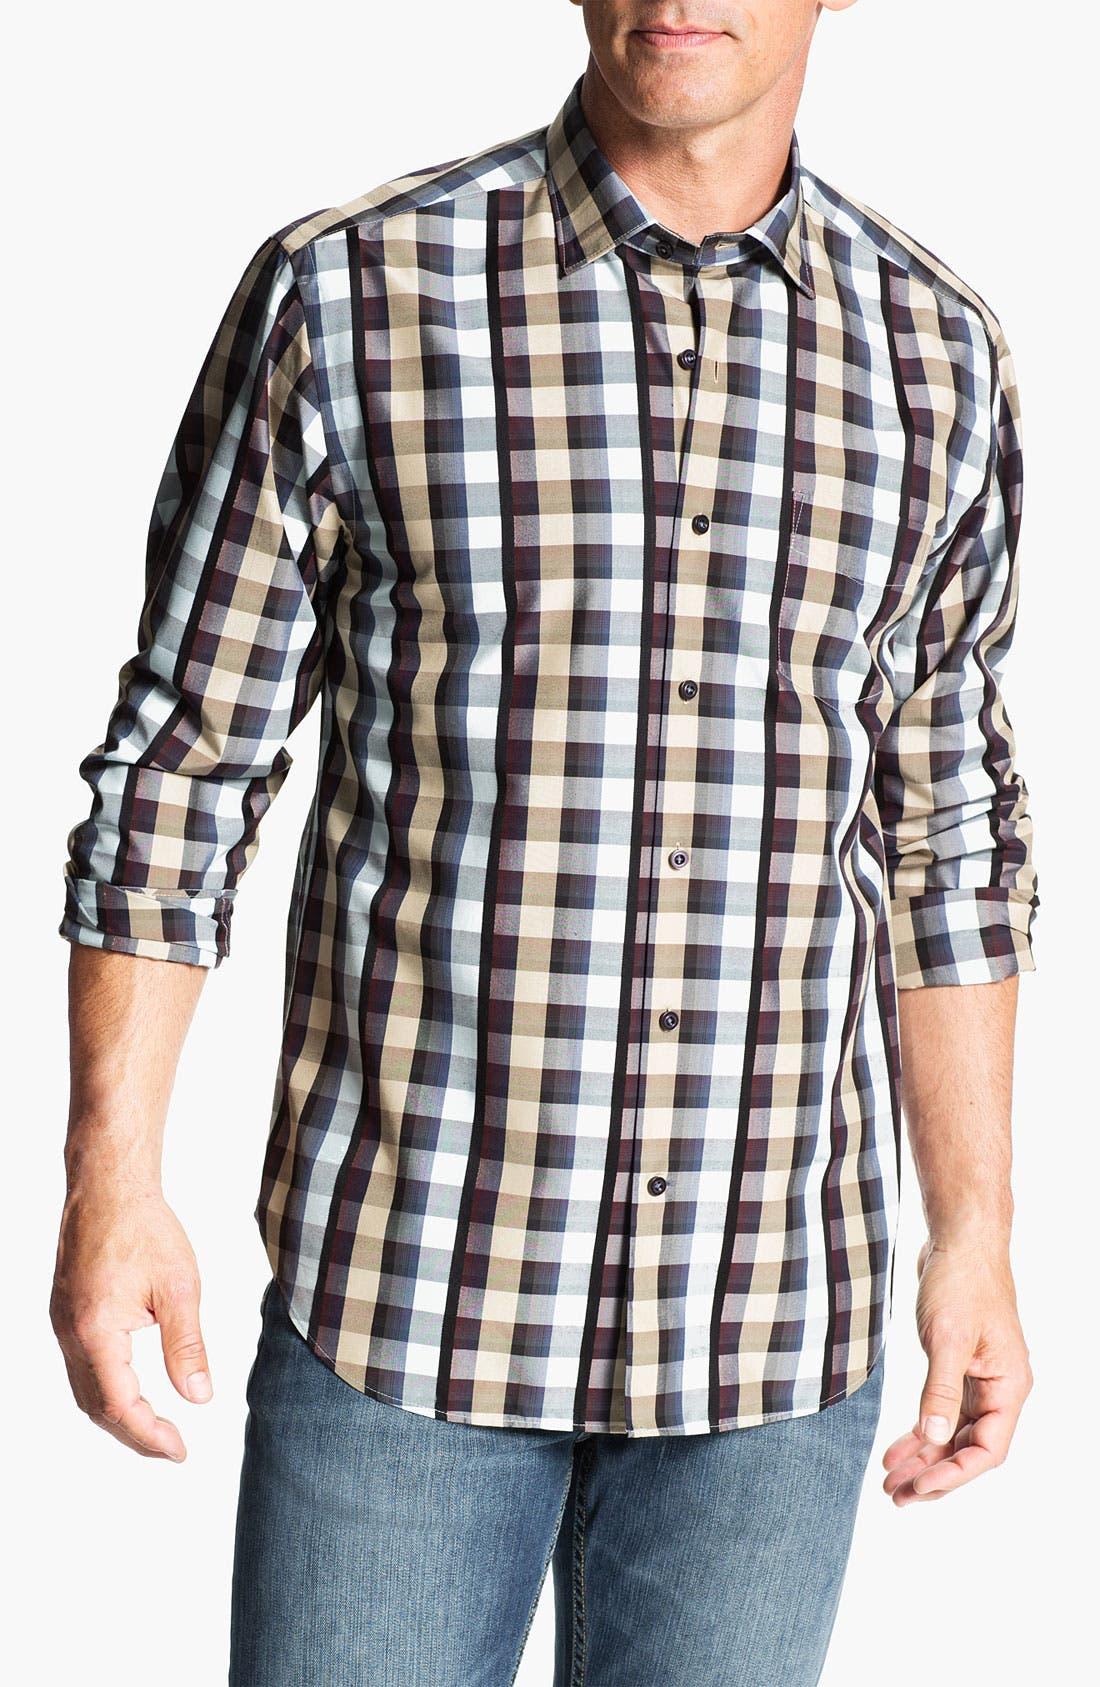 Alternate Image 1 Selected - Tommy Bahama 'Esprit de Coeur' Silk Sport Shirt